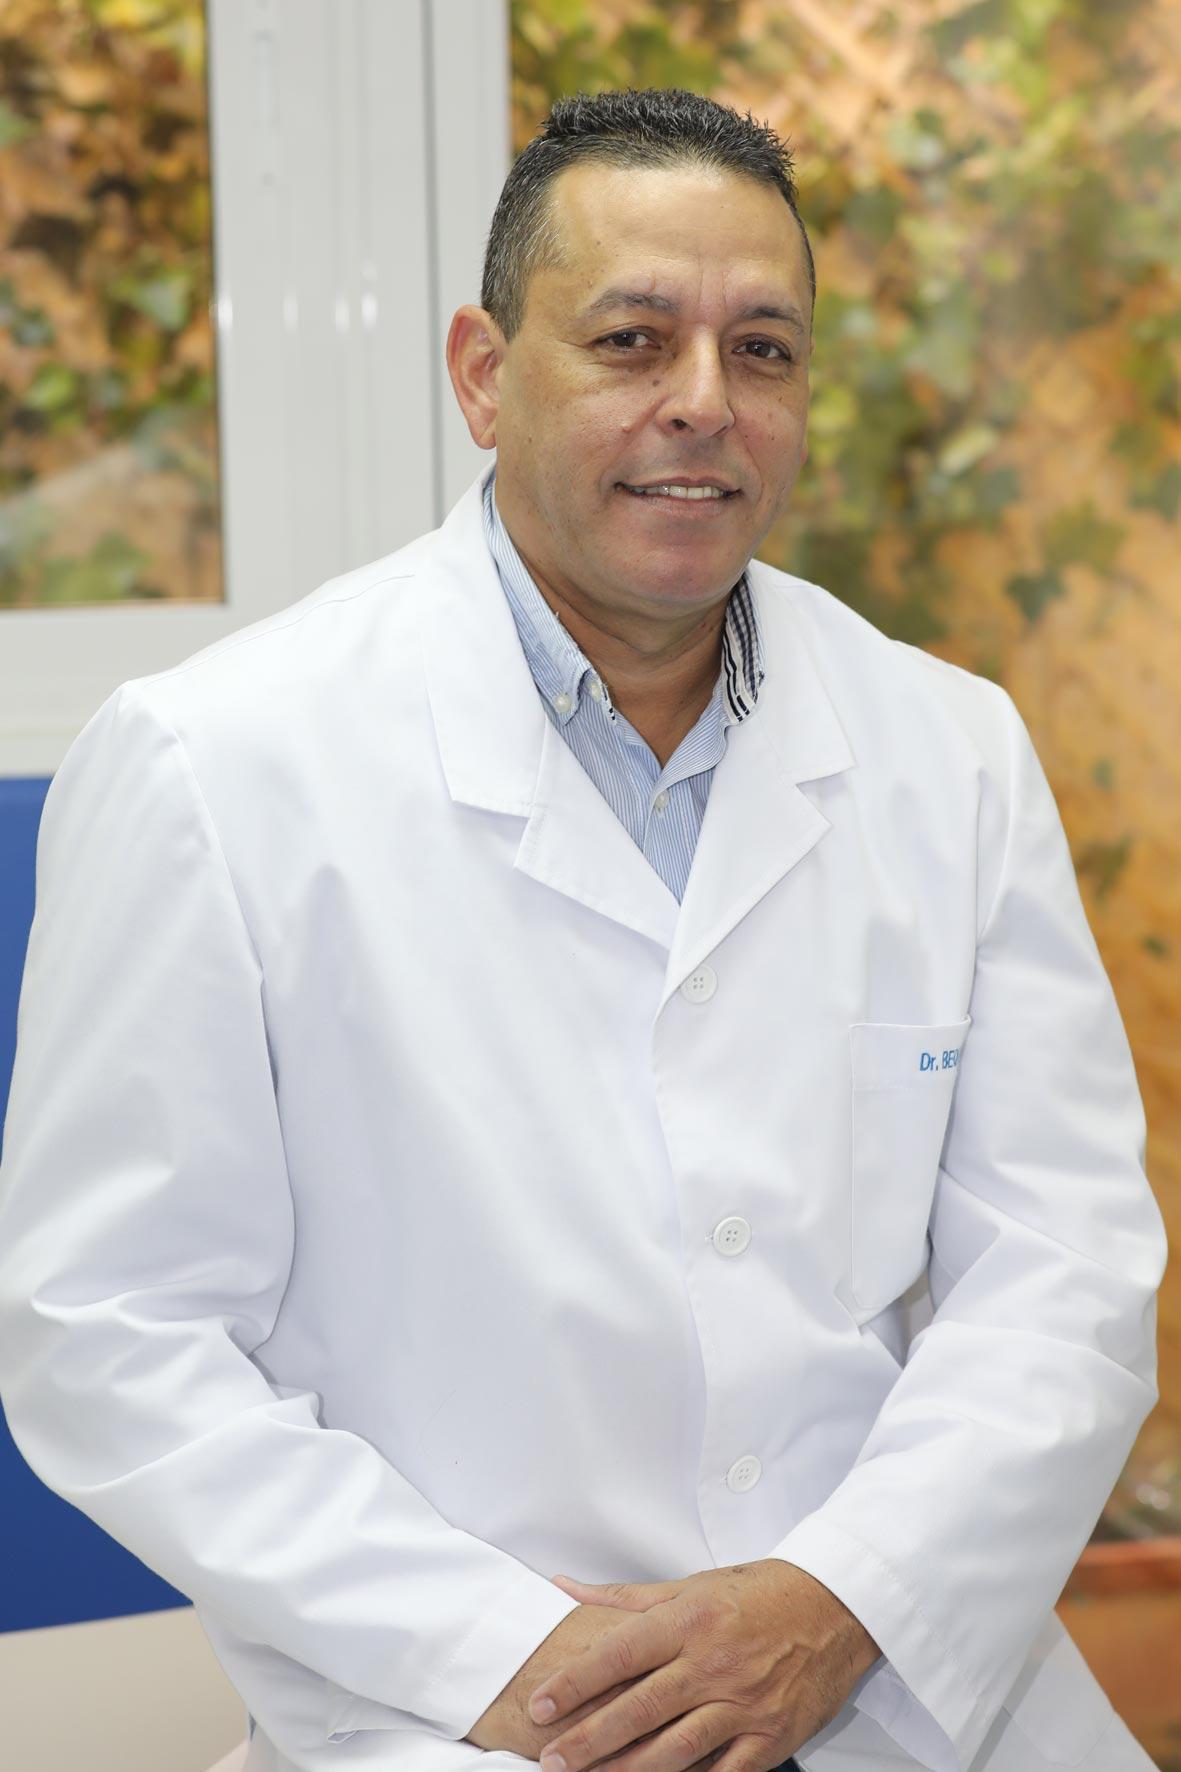 Dr. Mario Bequer